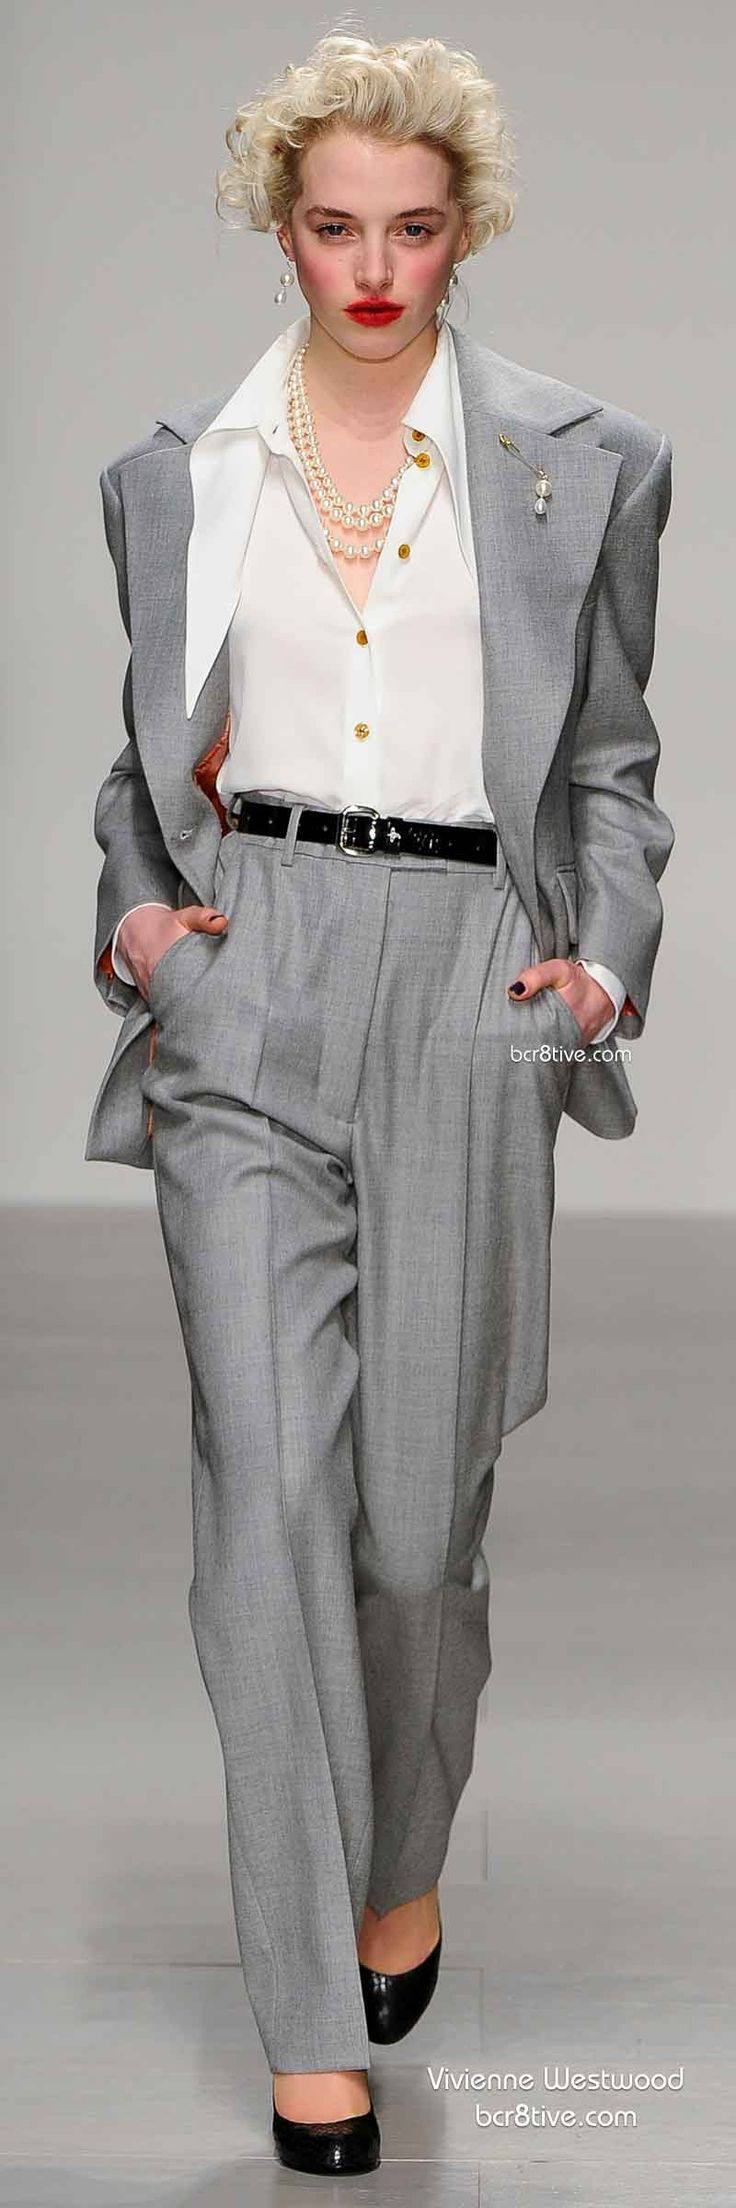 Fall 2014 Menswear Inspired Fashion